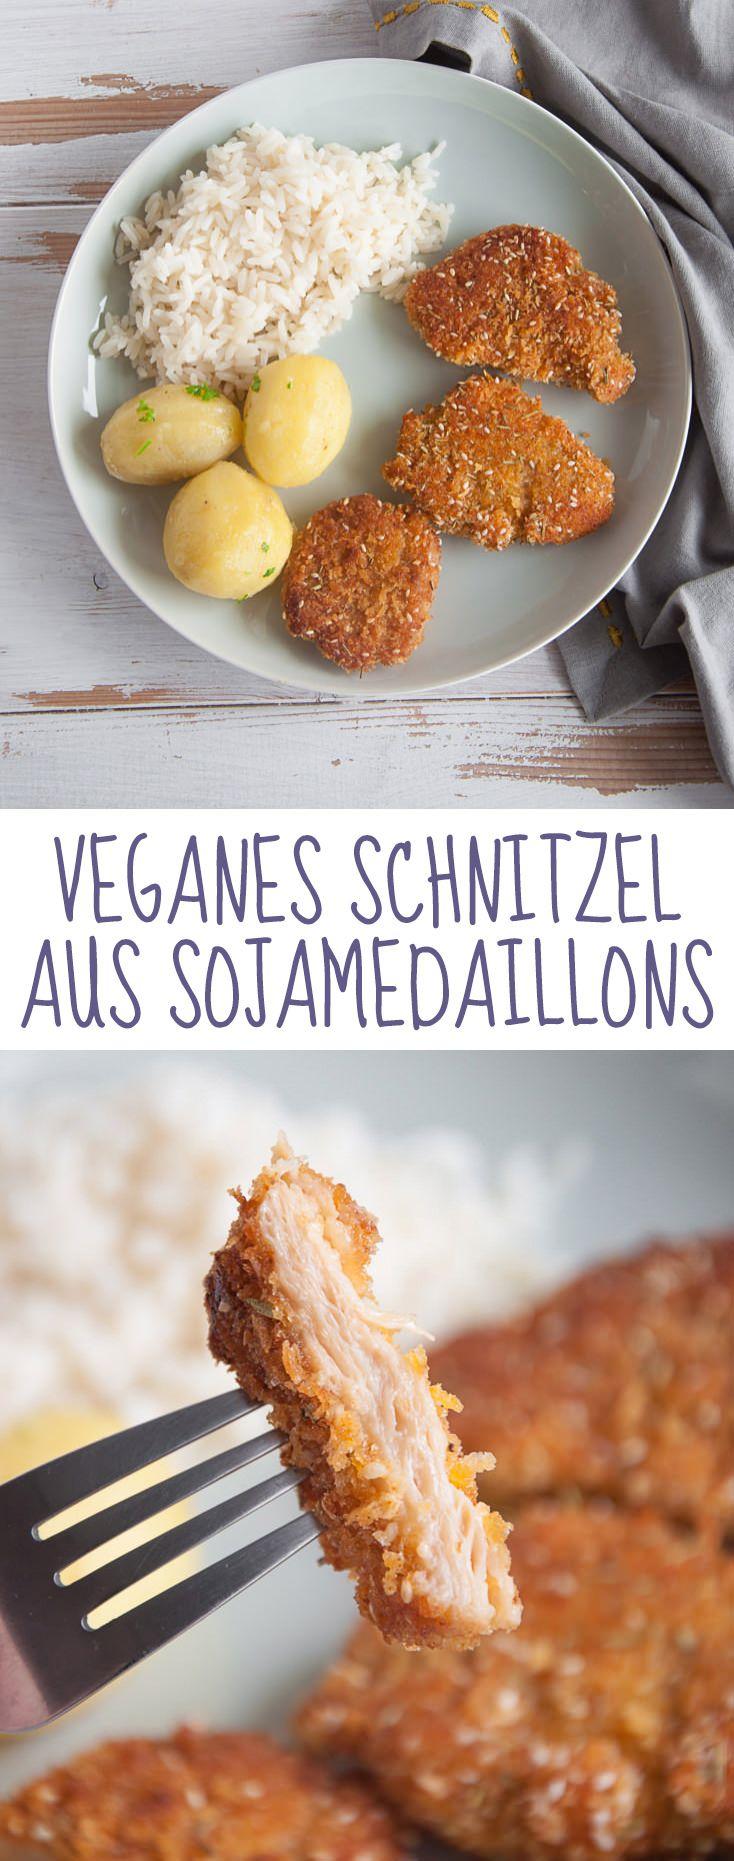 Veganes Schnitzel aus Sojamedaillons   VeganmitGenuss.com